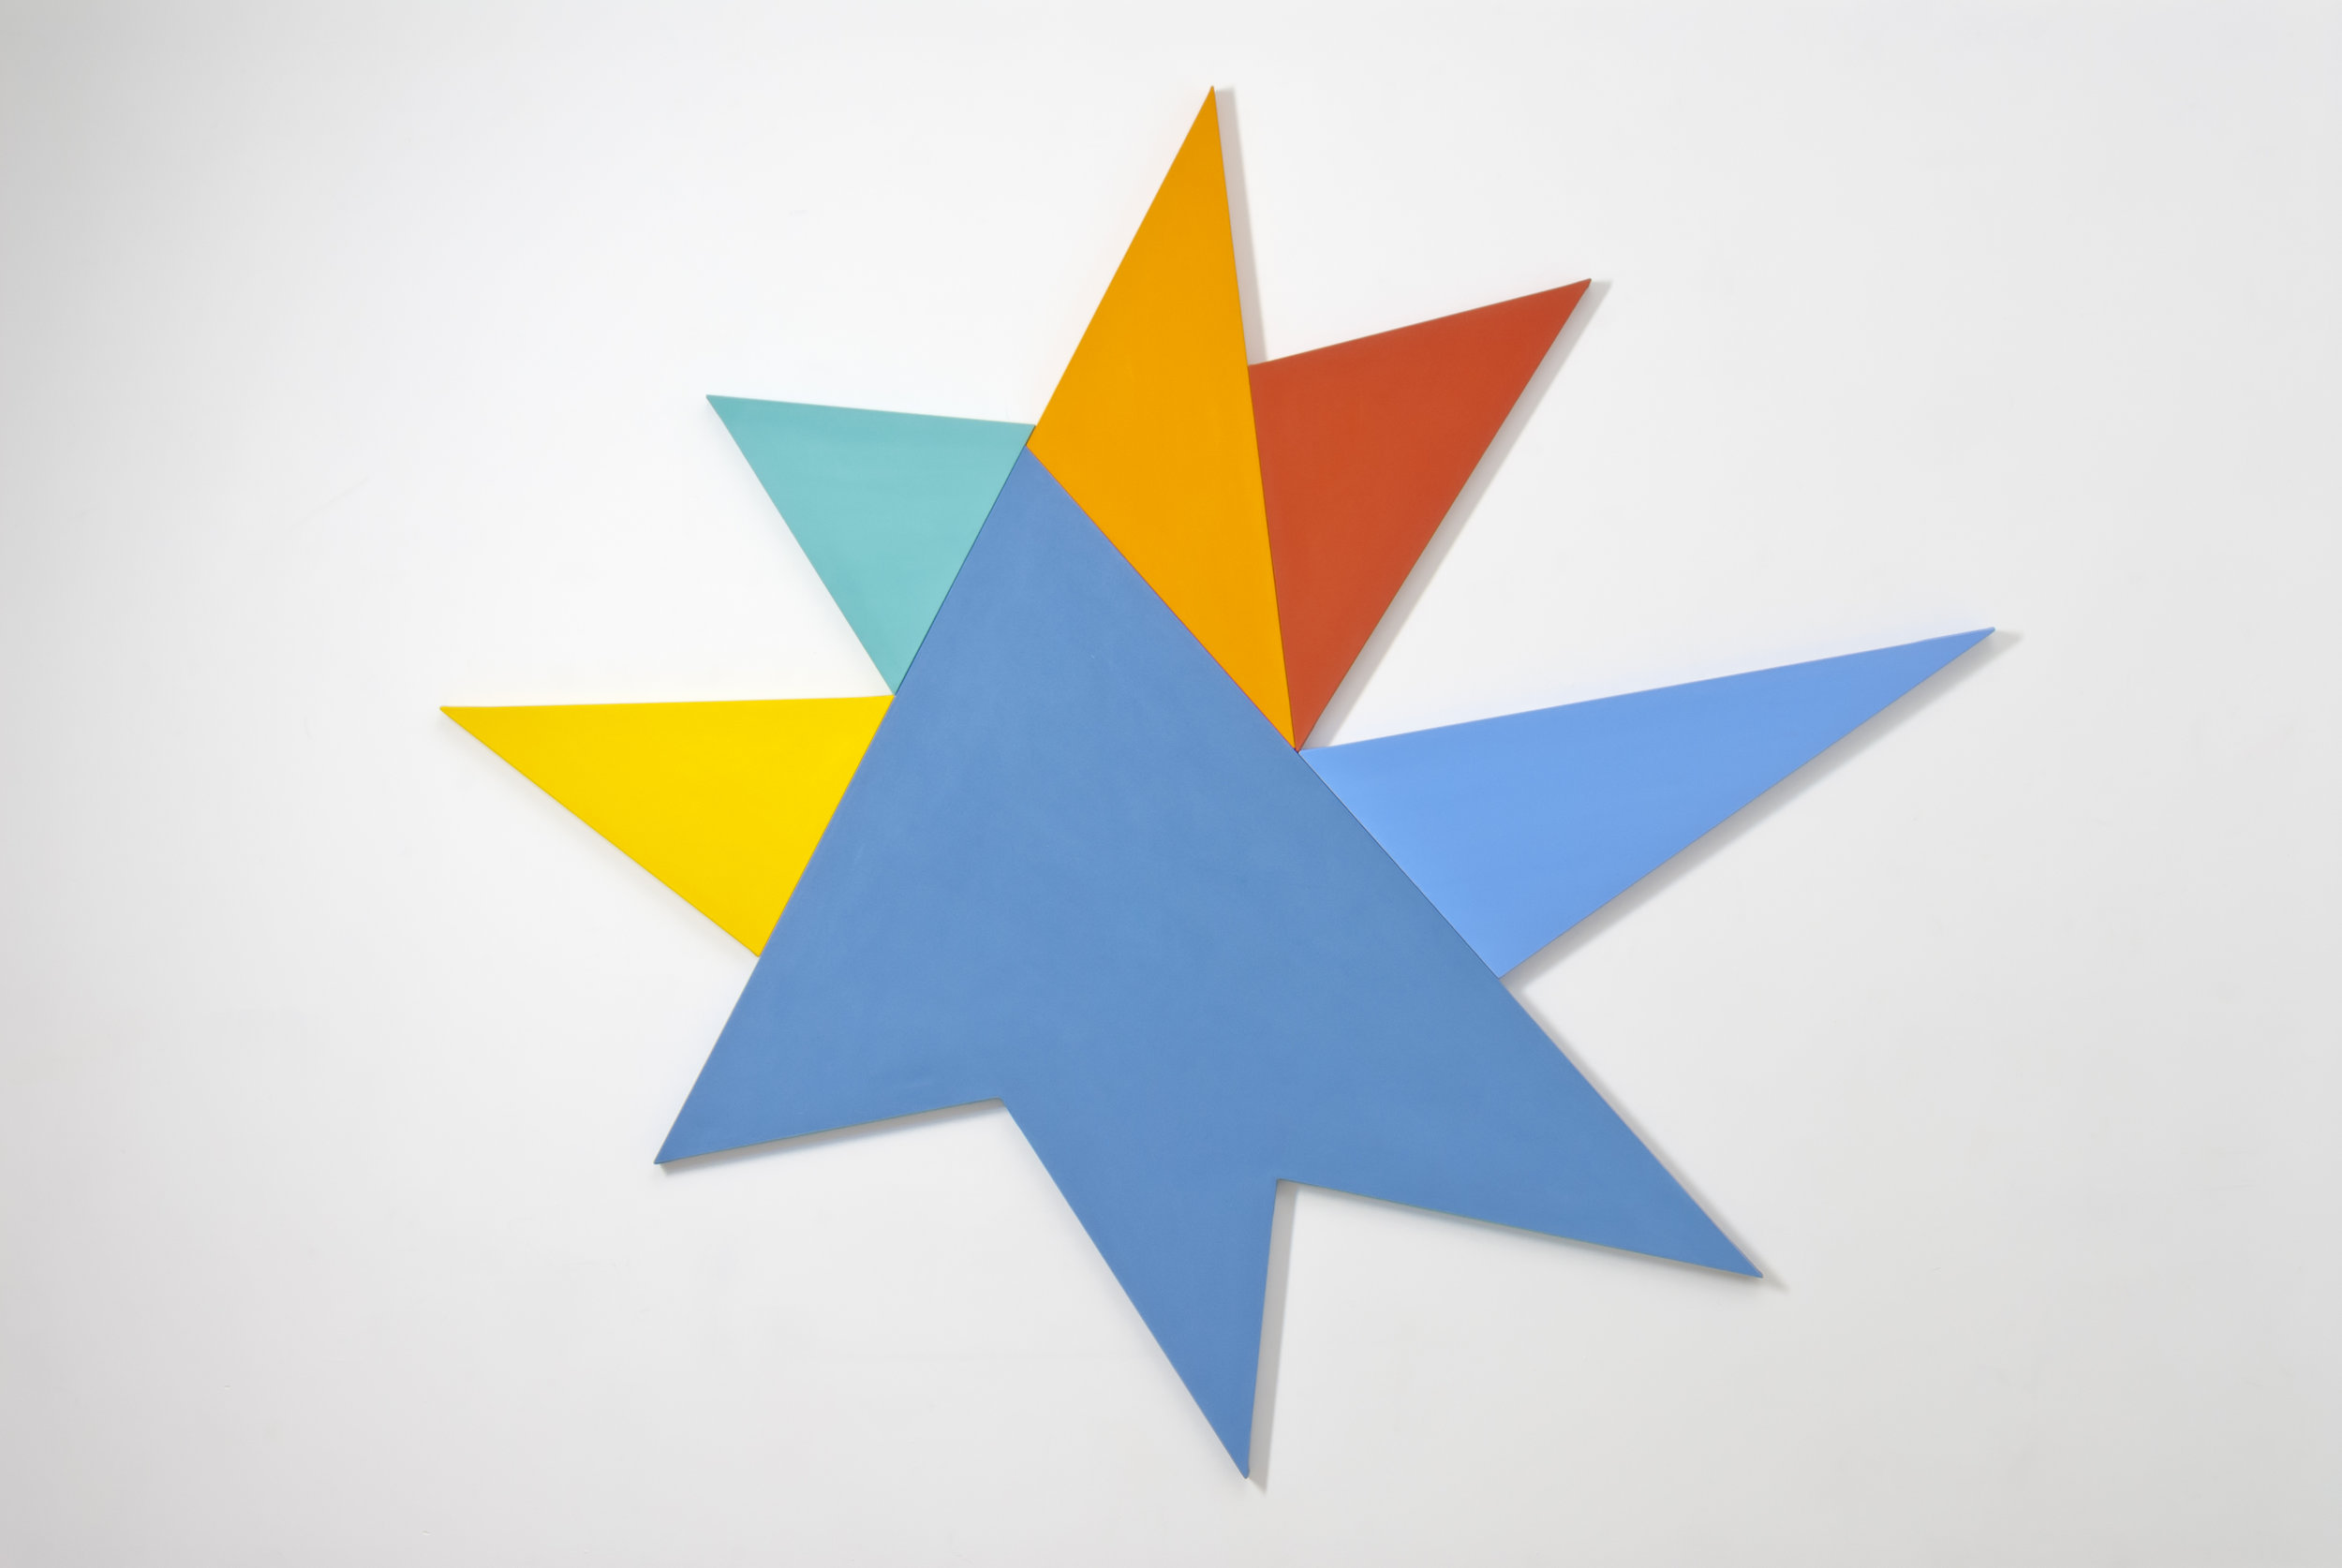 Infinex #32 , 2014, acrylic on canvas, 210 x 235.5 cm.